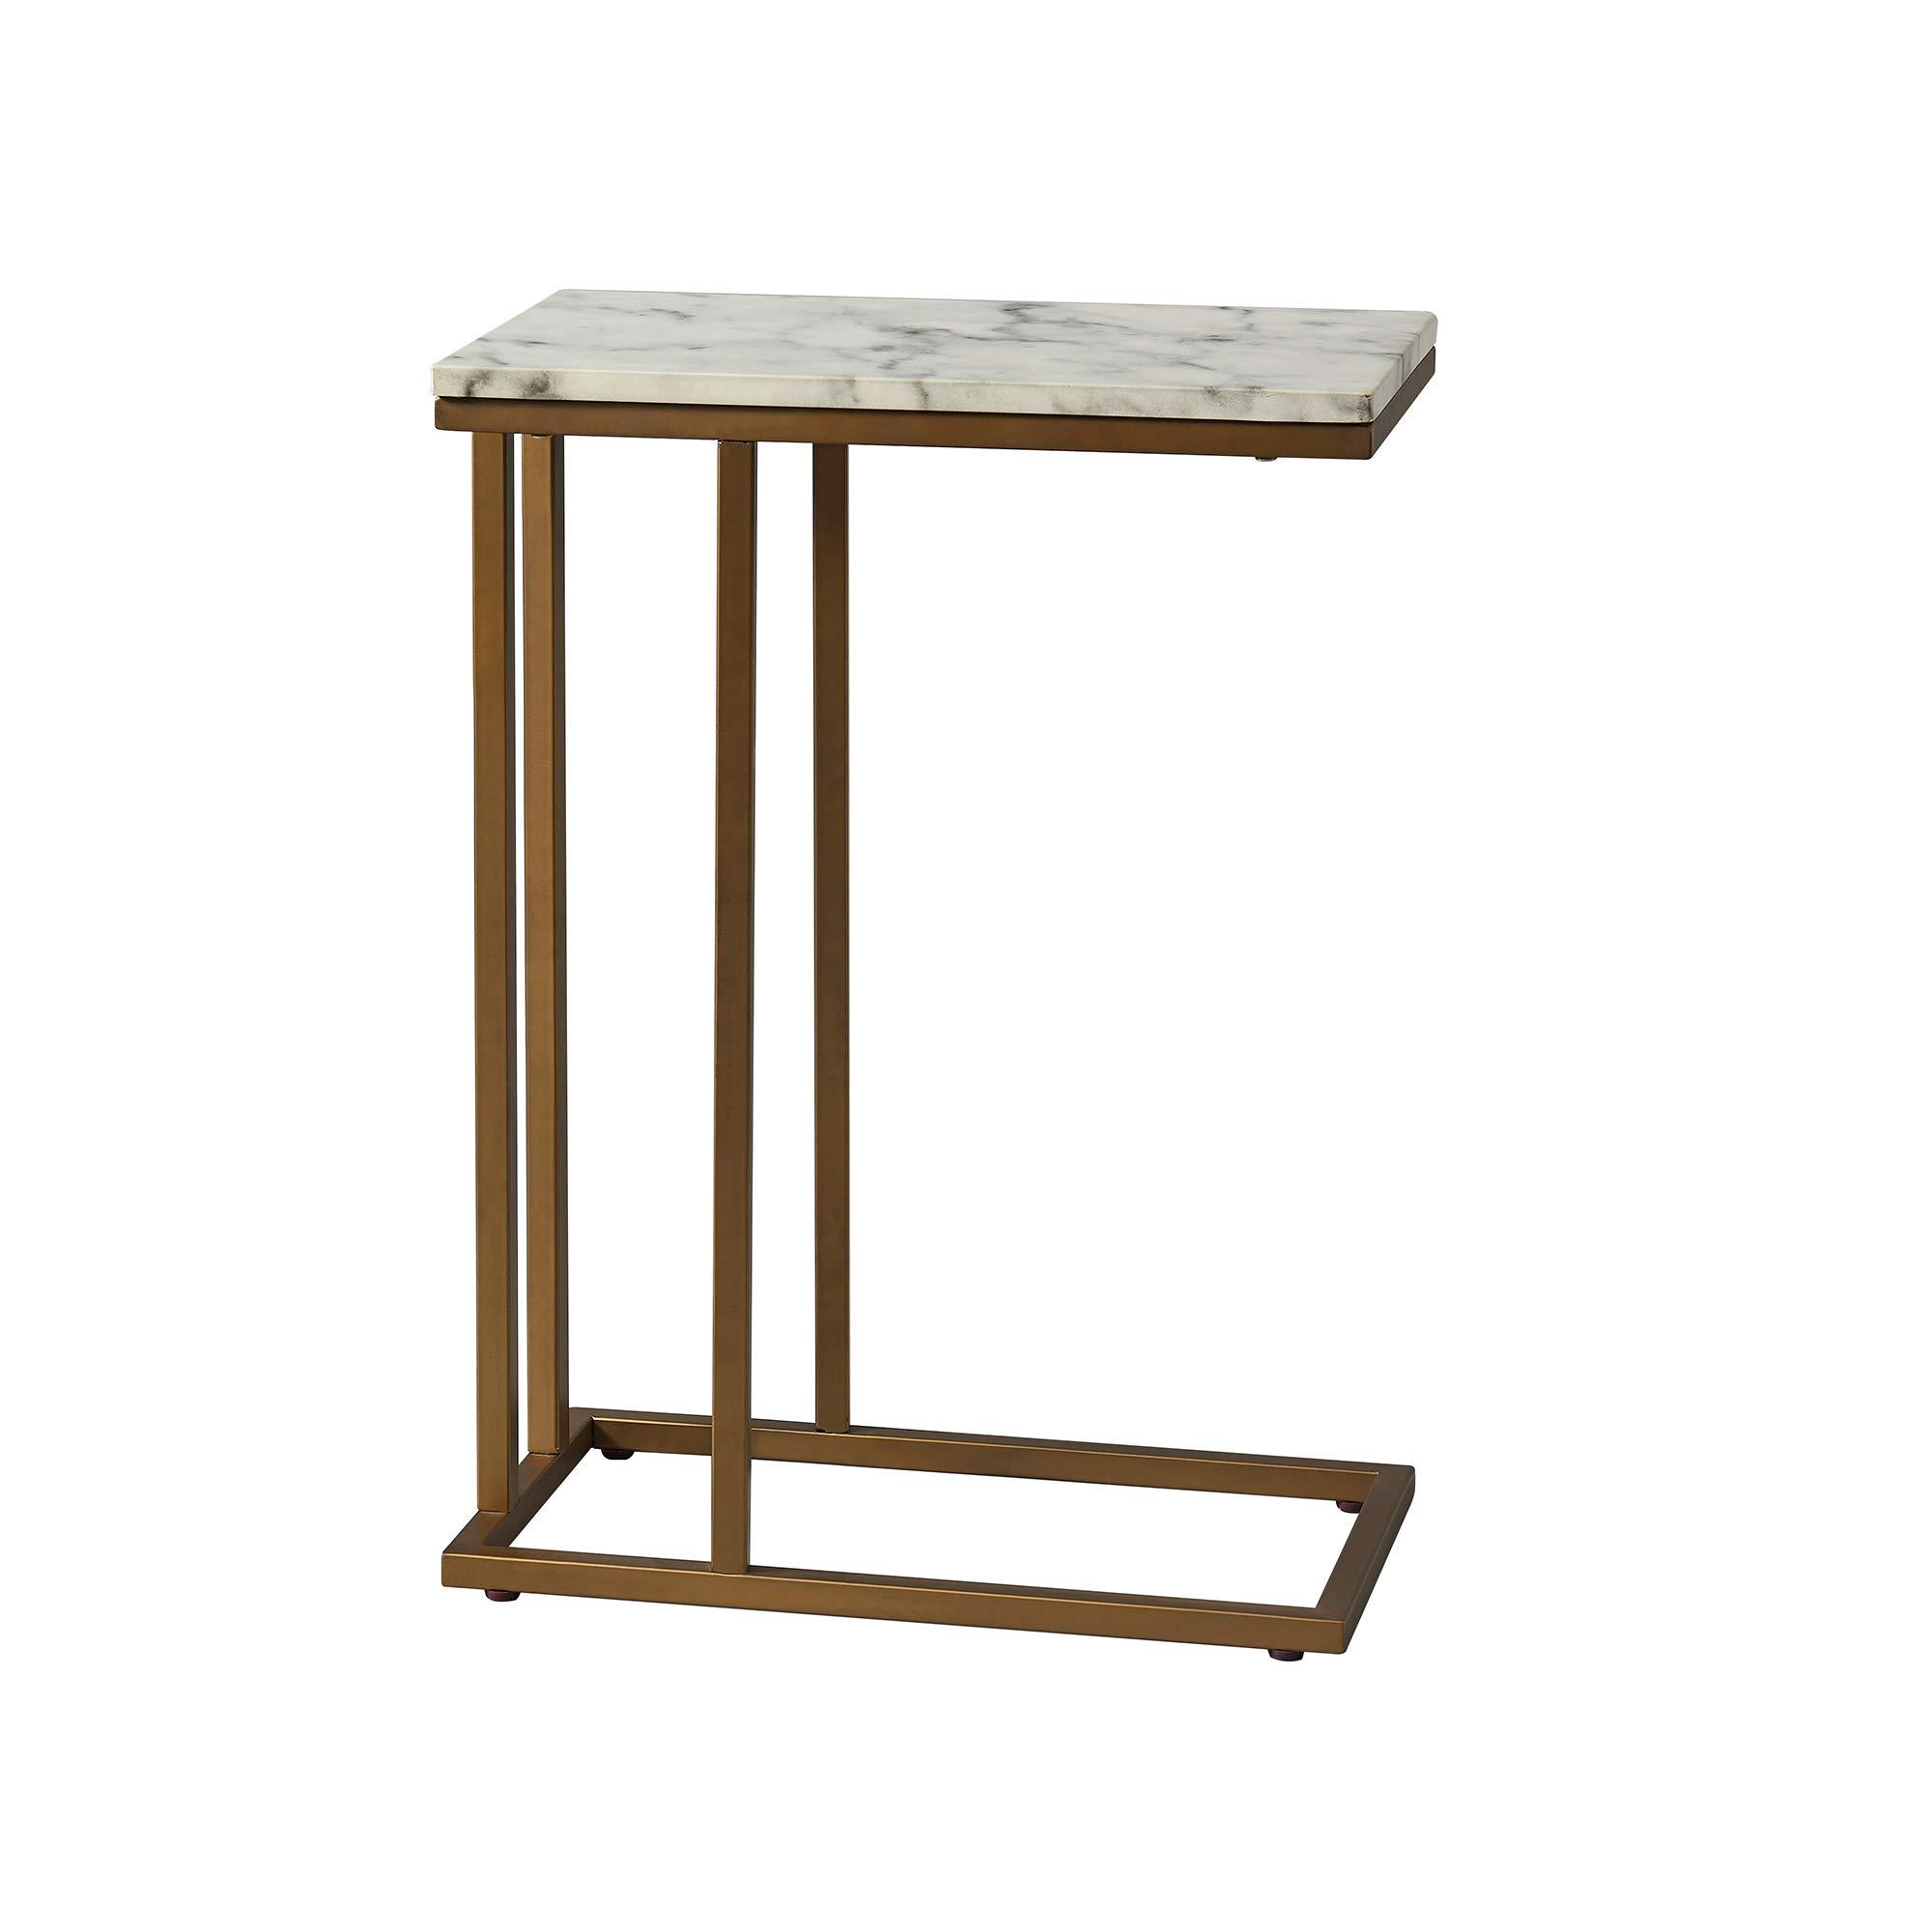 Versanora - Marmo C Shape Table - Faux Marble /Brass by Versanora (Image #5)